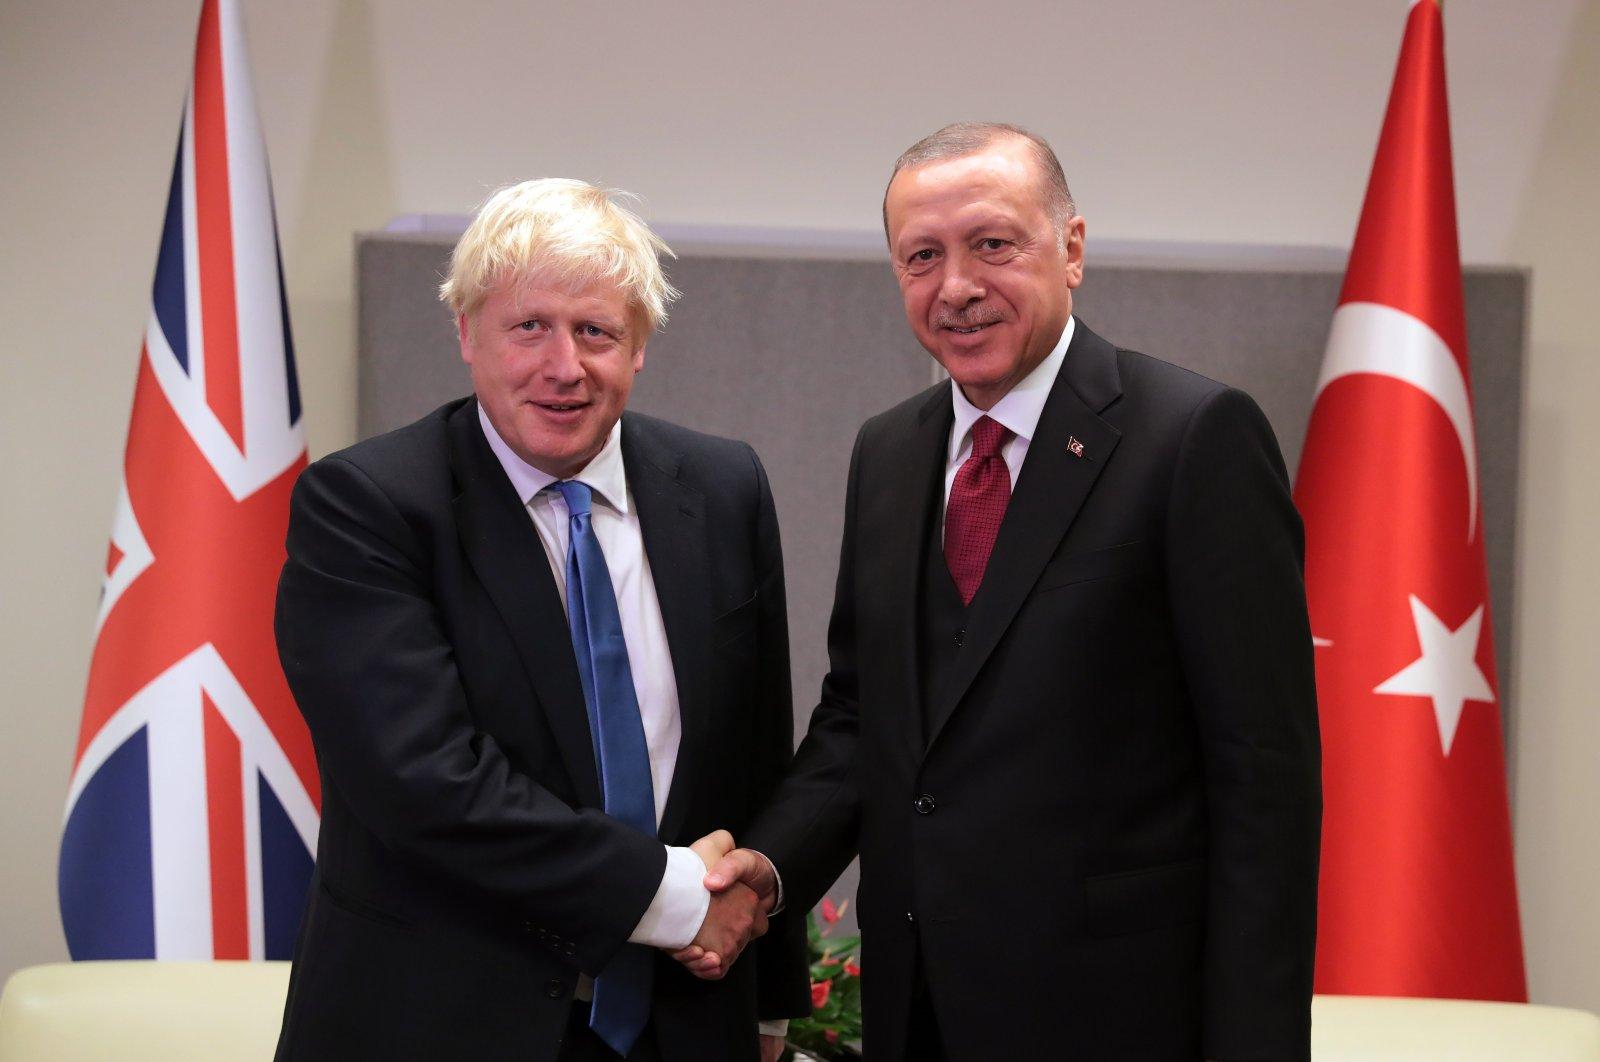 U.K. Prime Minister Boris Johnson and President Recep Tayyip Erdoğan shake hands during a meeting in New York City, New York, U.S., Sept. 25, 2019. (IHA Photo)